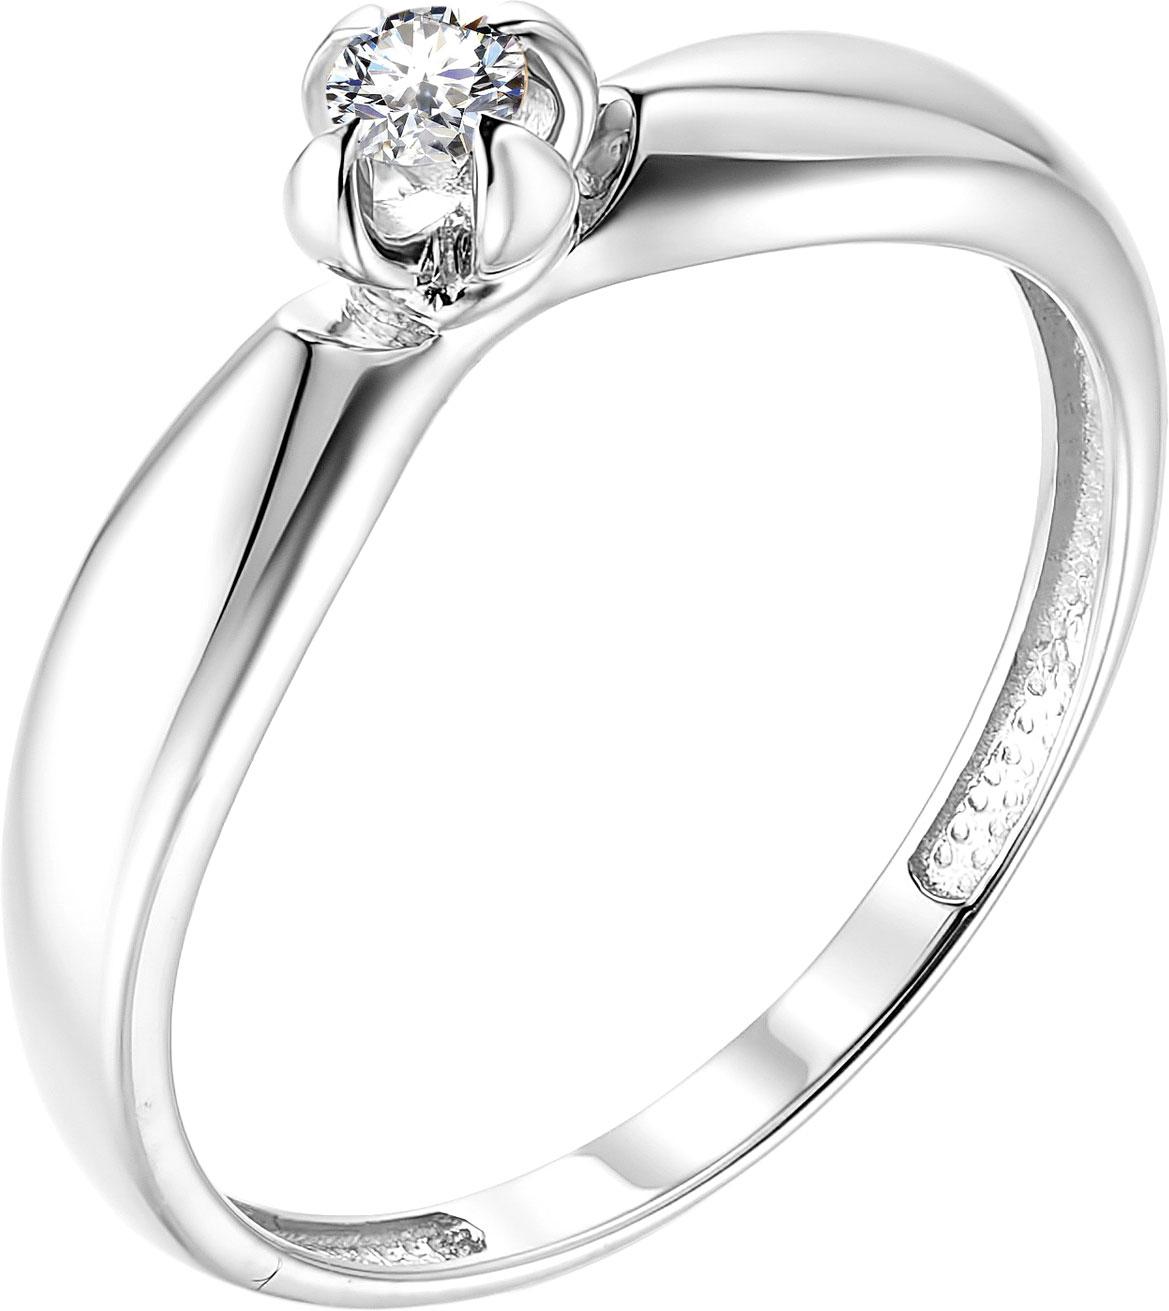 Кольца Алькор 13170-200